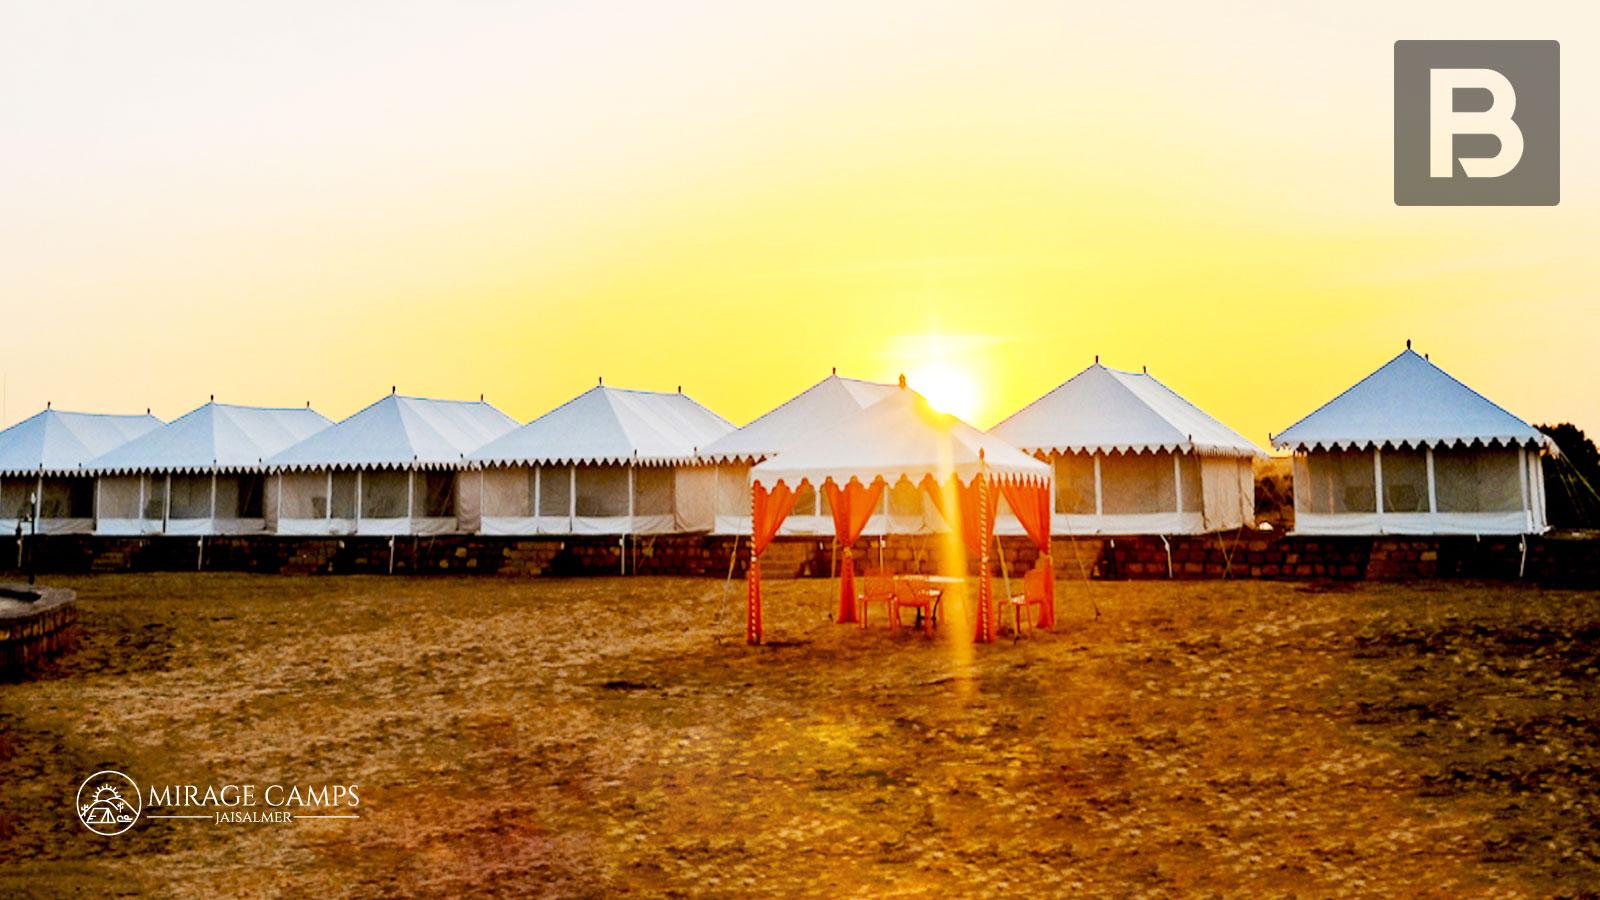 Beyond Stay Mirage Camps, Jaisalmer